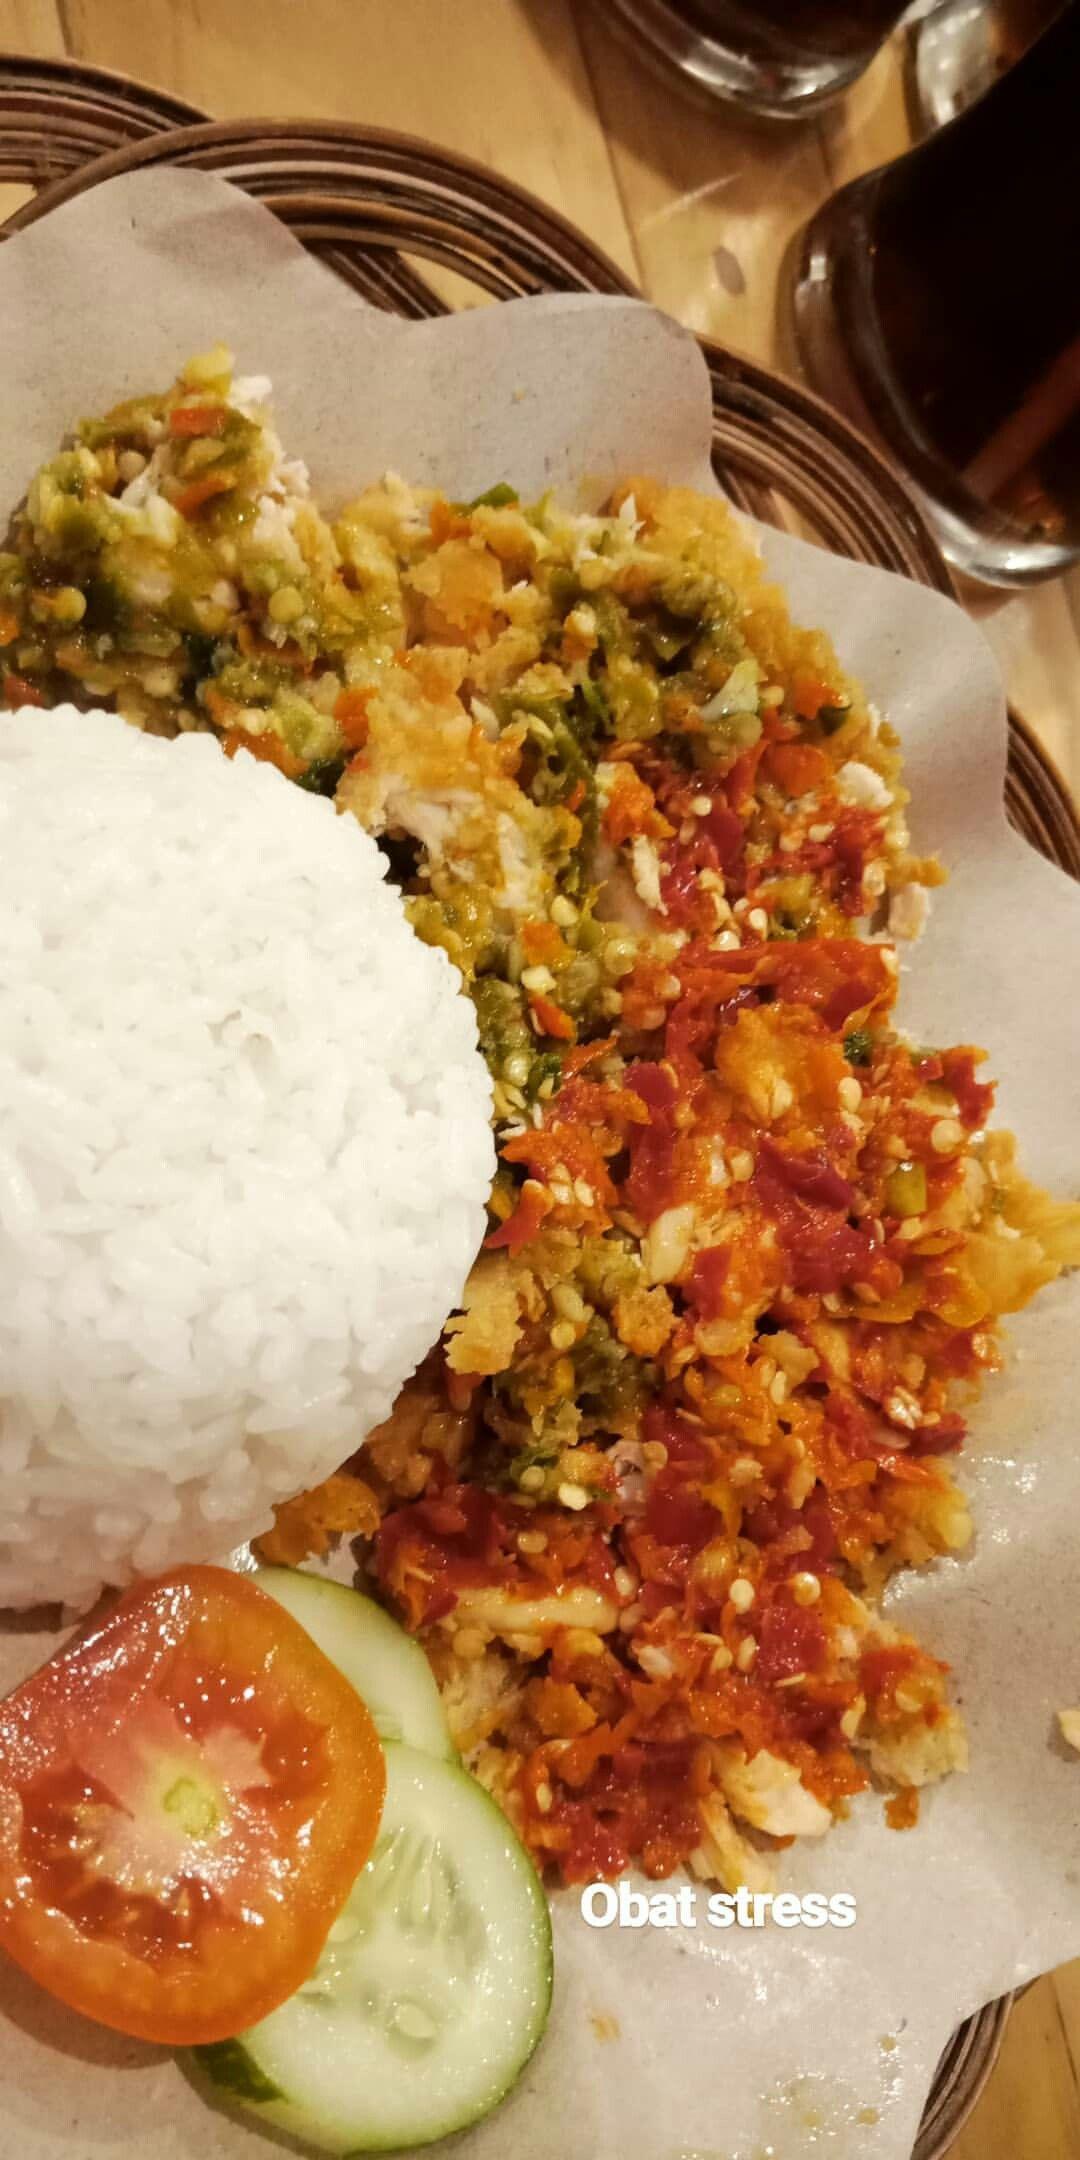 Pin Oleh Nyonya Jeon197 Di Food My Mood Ide Makanan Makanan Dan Minuman Makanan